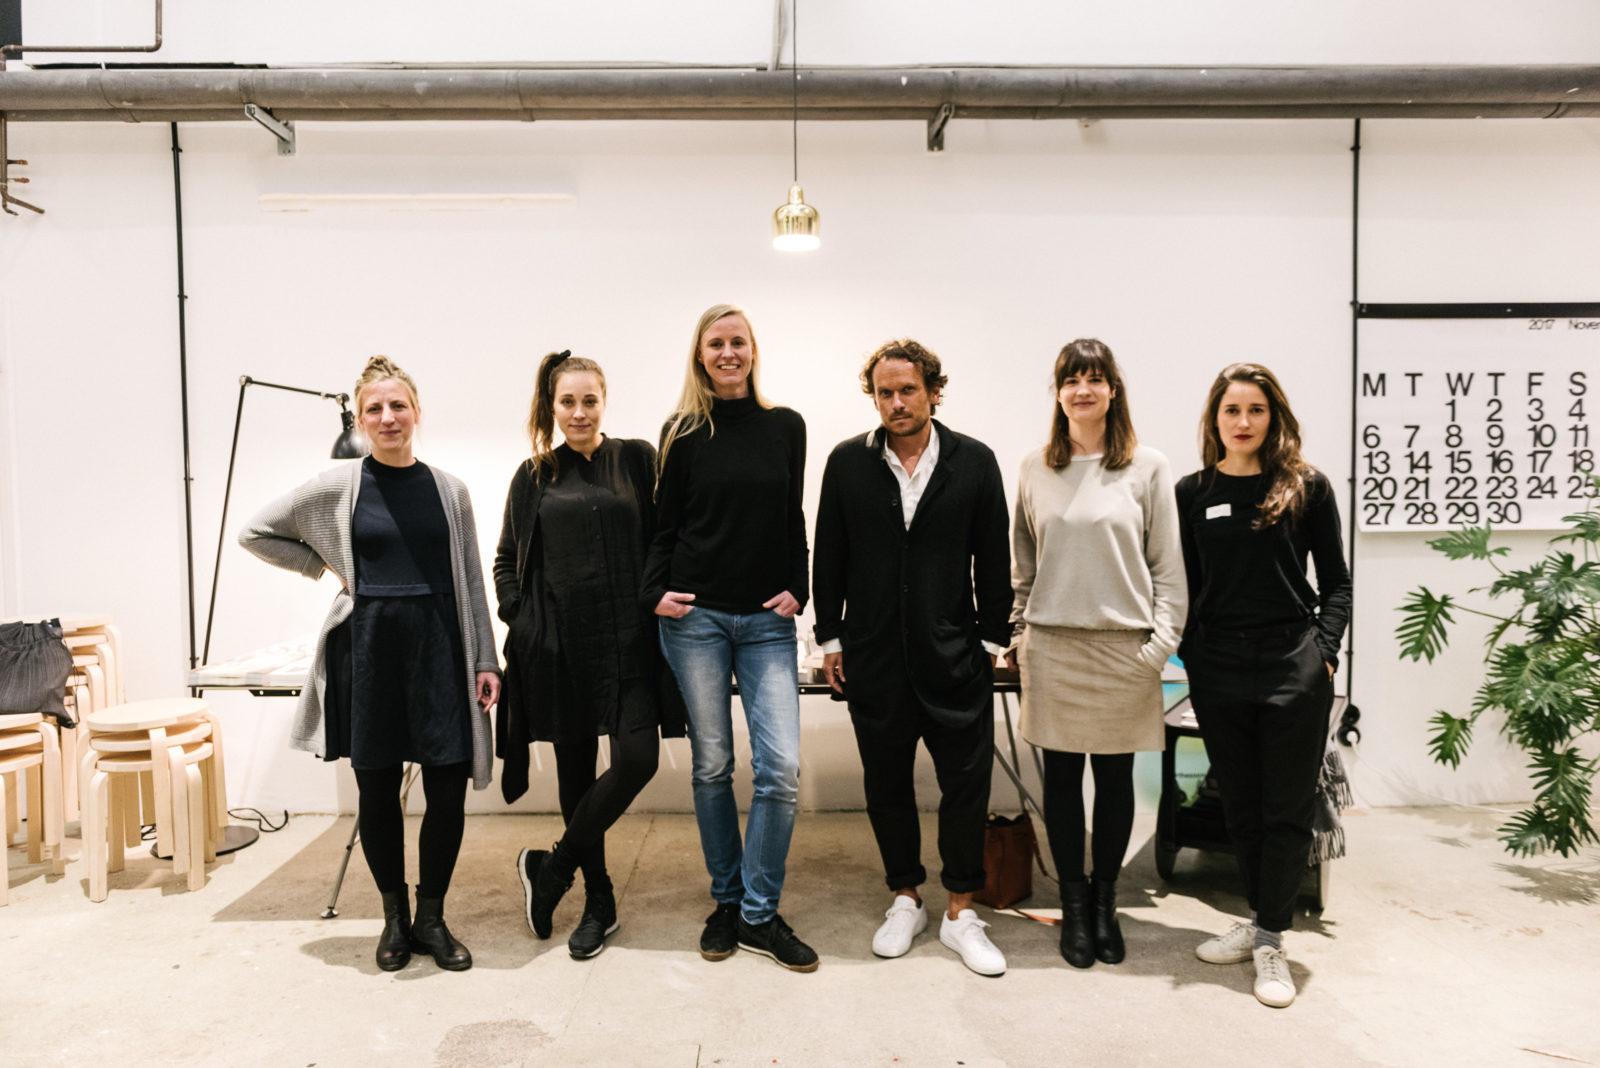 Lea Korzeczek, Anna Schunck, Florentine-Amelie Rost, Oke Hauser, Corinna Natter, Caroline Kurze